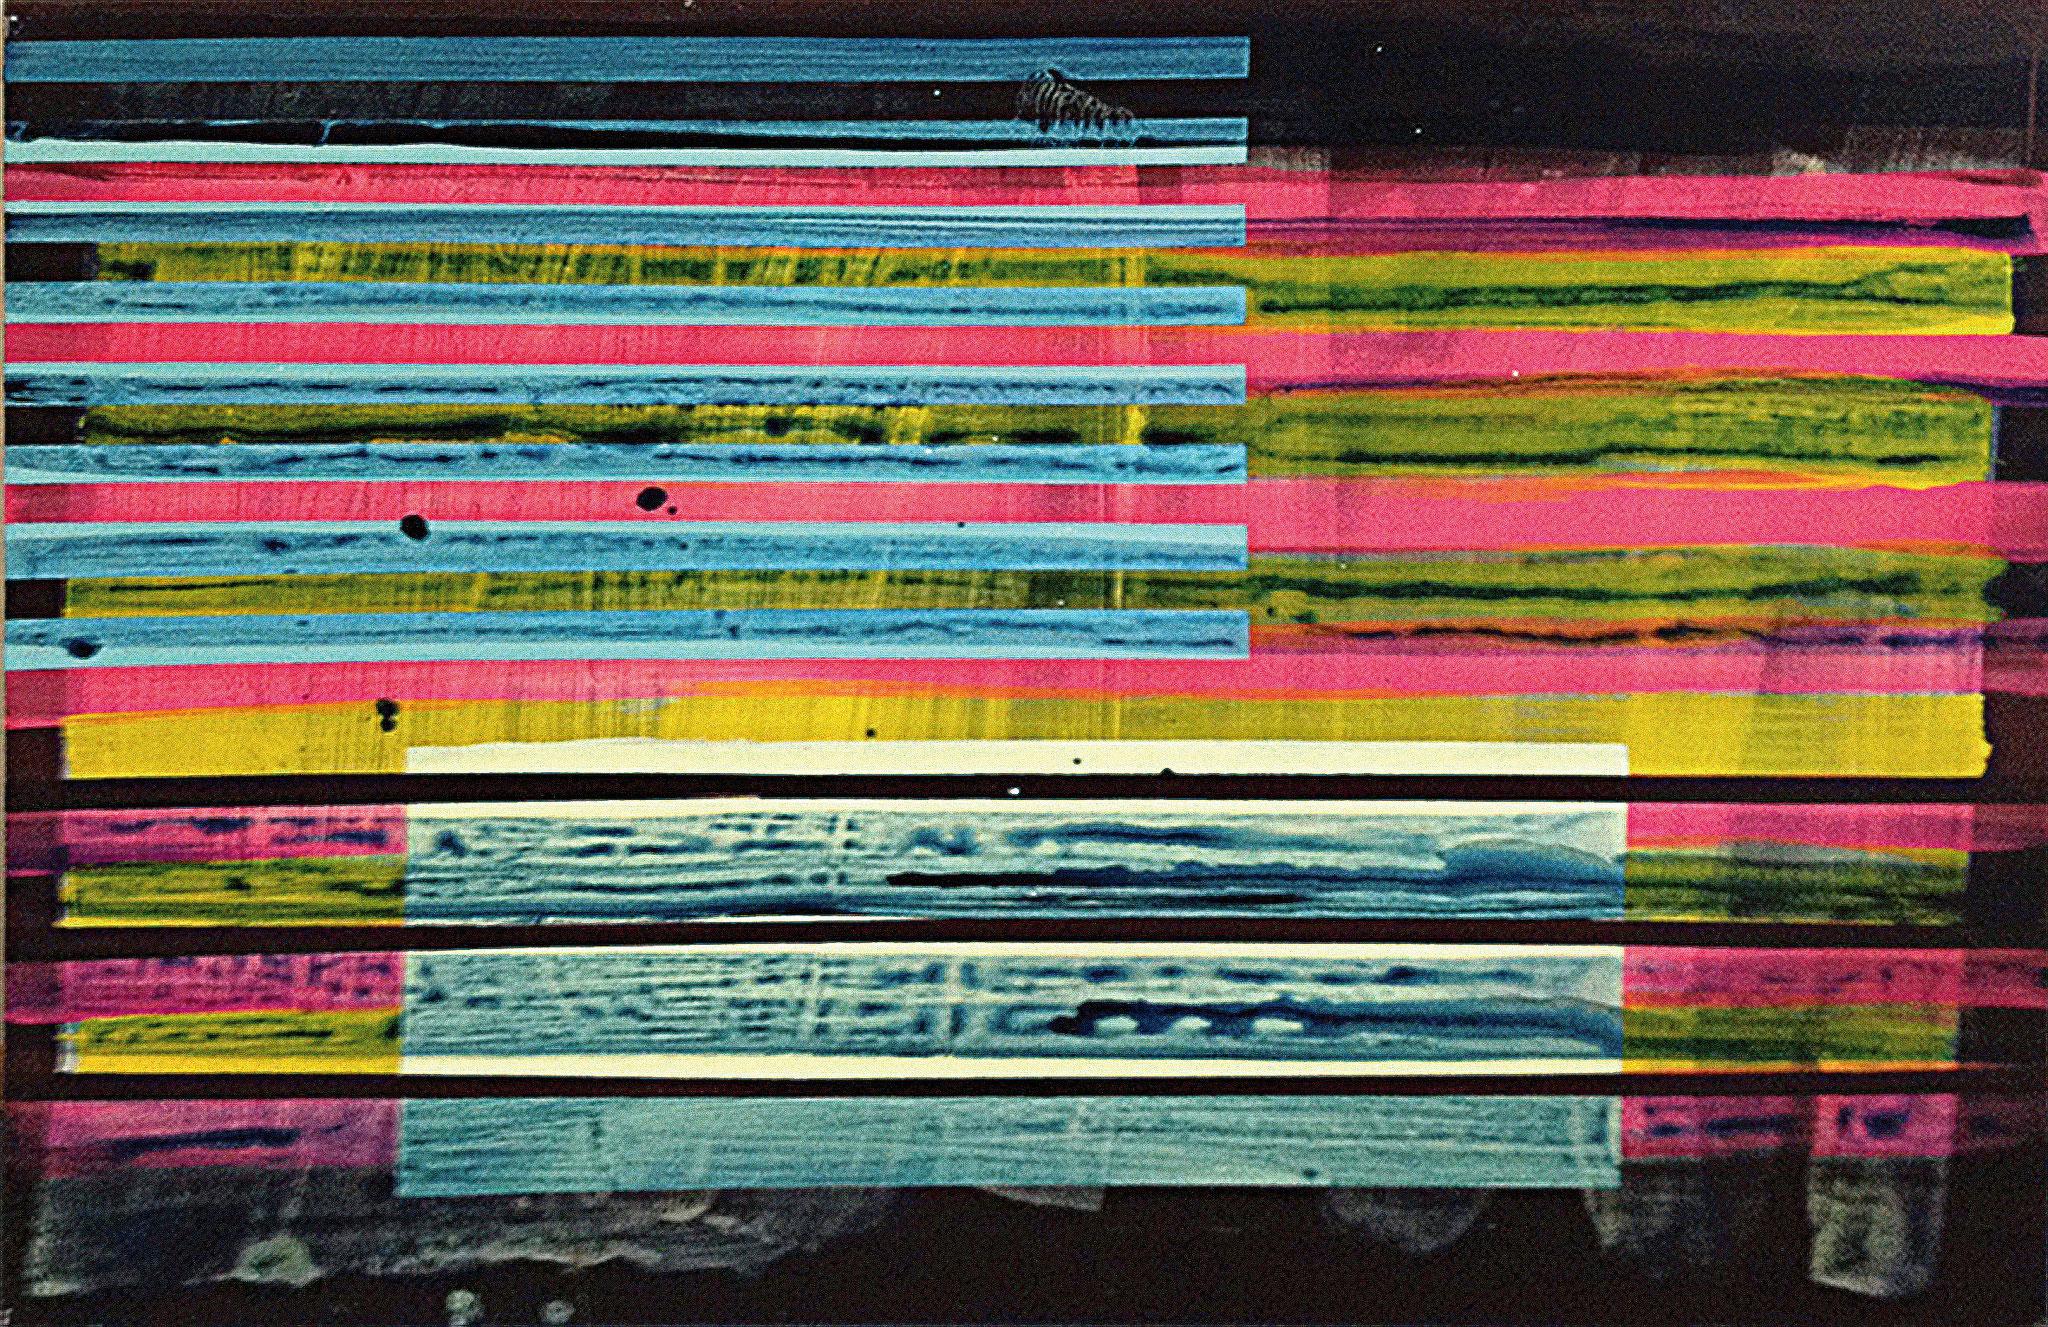 Stripes II   140x100cm 2013 Pigmente / Binder auf Leinwand